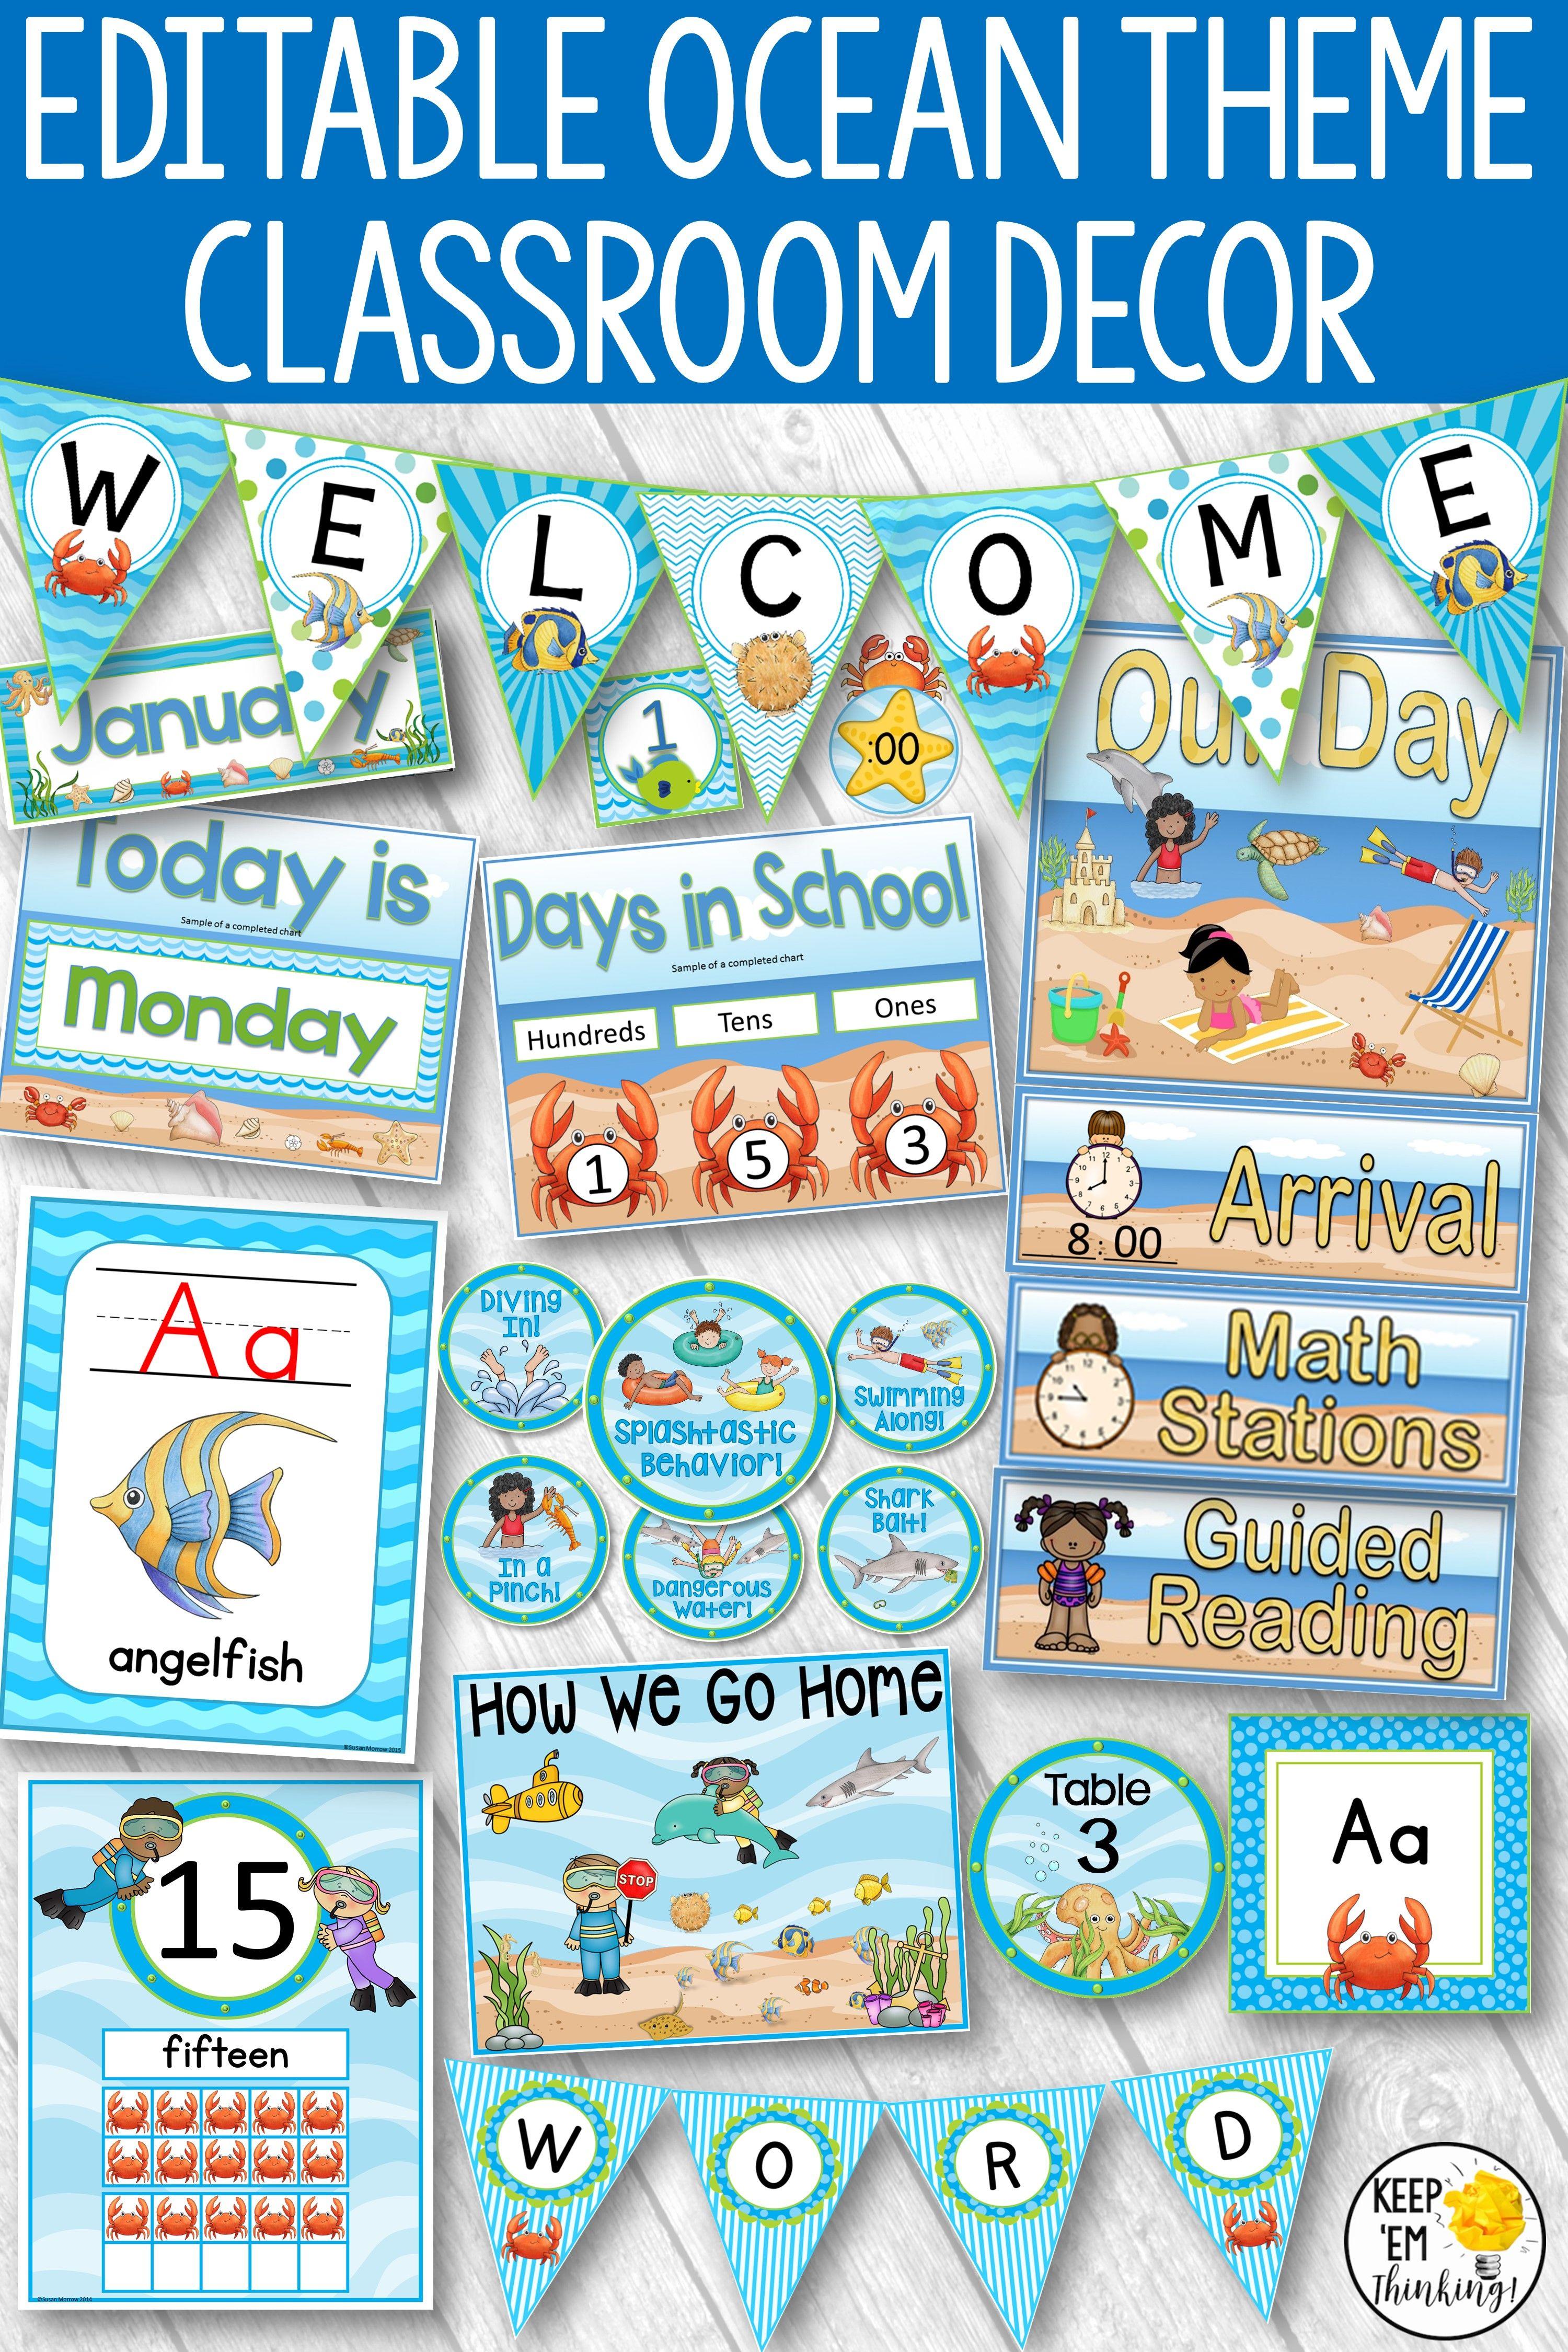 Ocean Theme Classroom Decor Bundle Editable Classroom